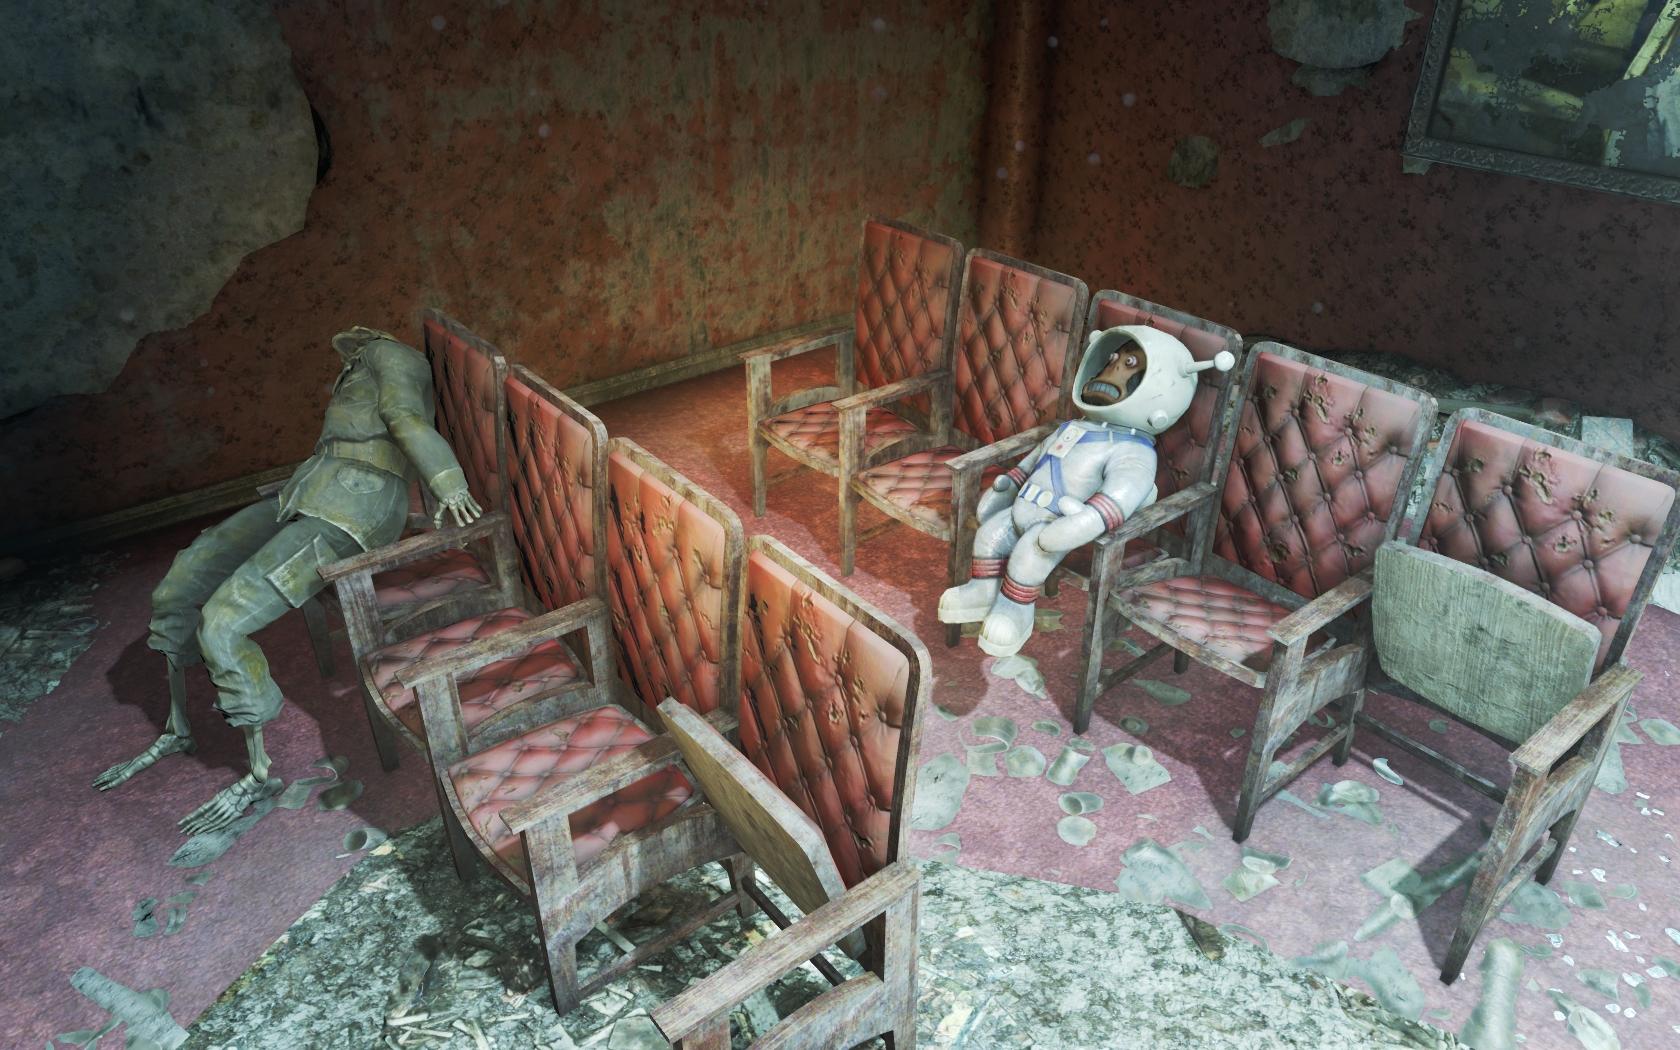 Театр Уоррена 2 - Fallout 4 Юмор